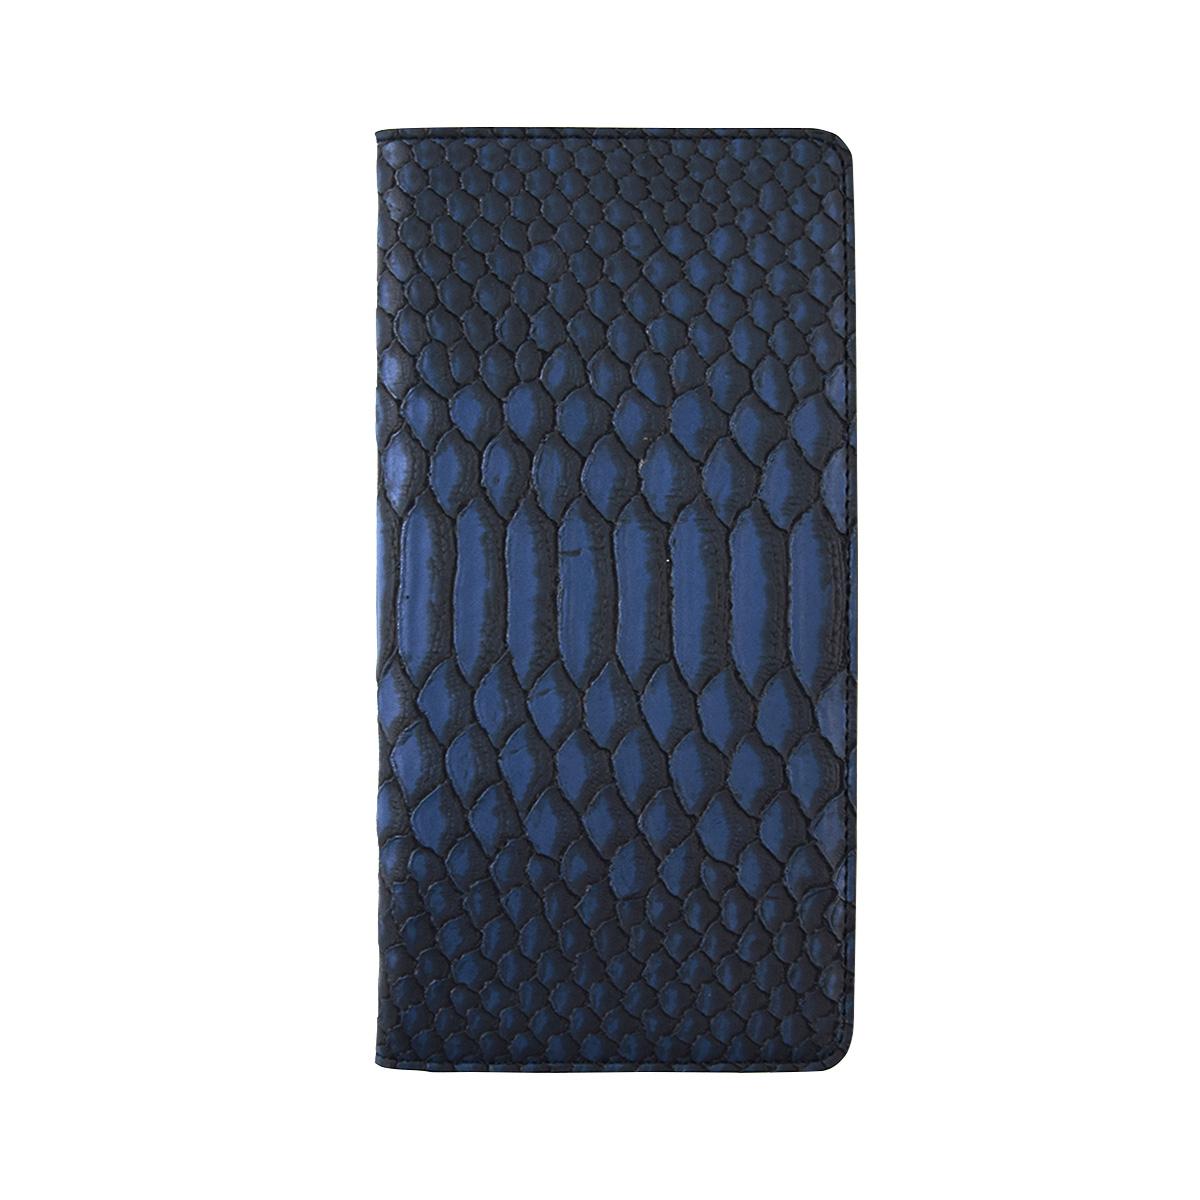 iPhone XS / X ケース iPhone XS Max ケース iPhone XR ケースGAZE Matt Python Diary 手帳型 (ゲイズ マットパイソンダイアリー)アイフォン カバー